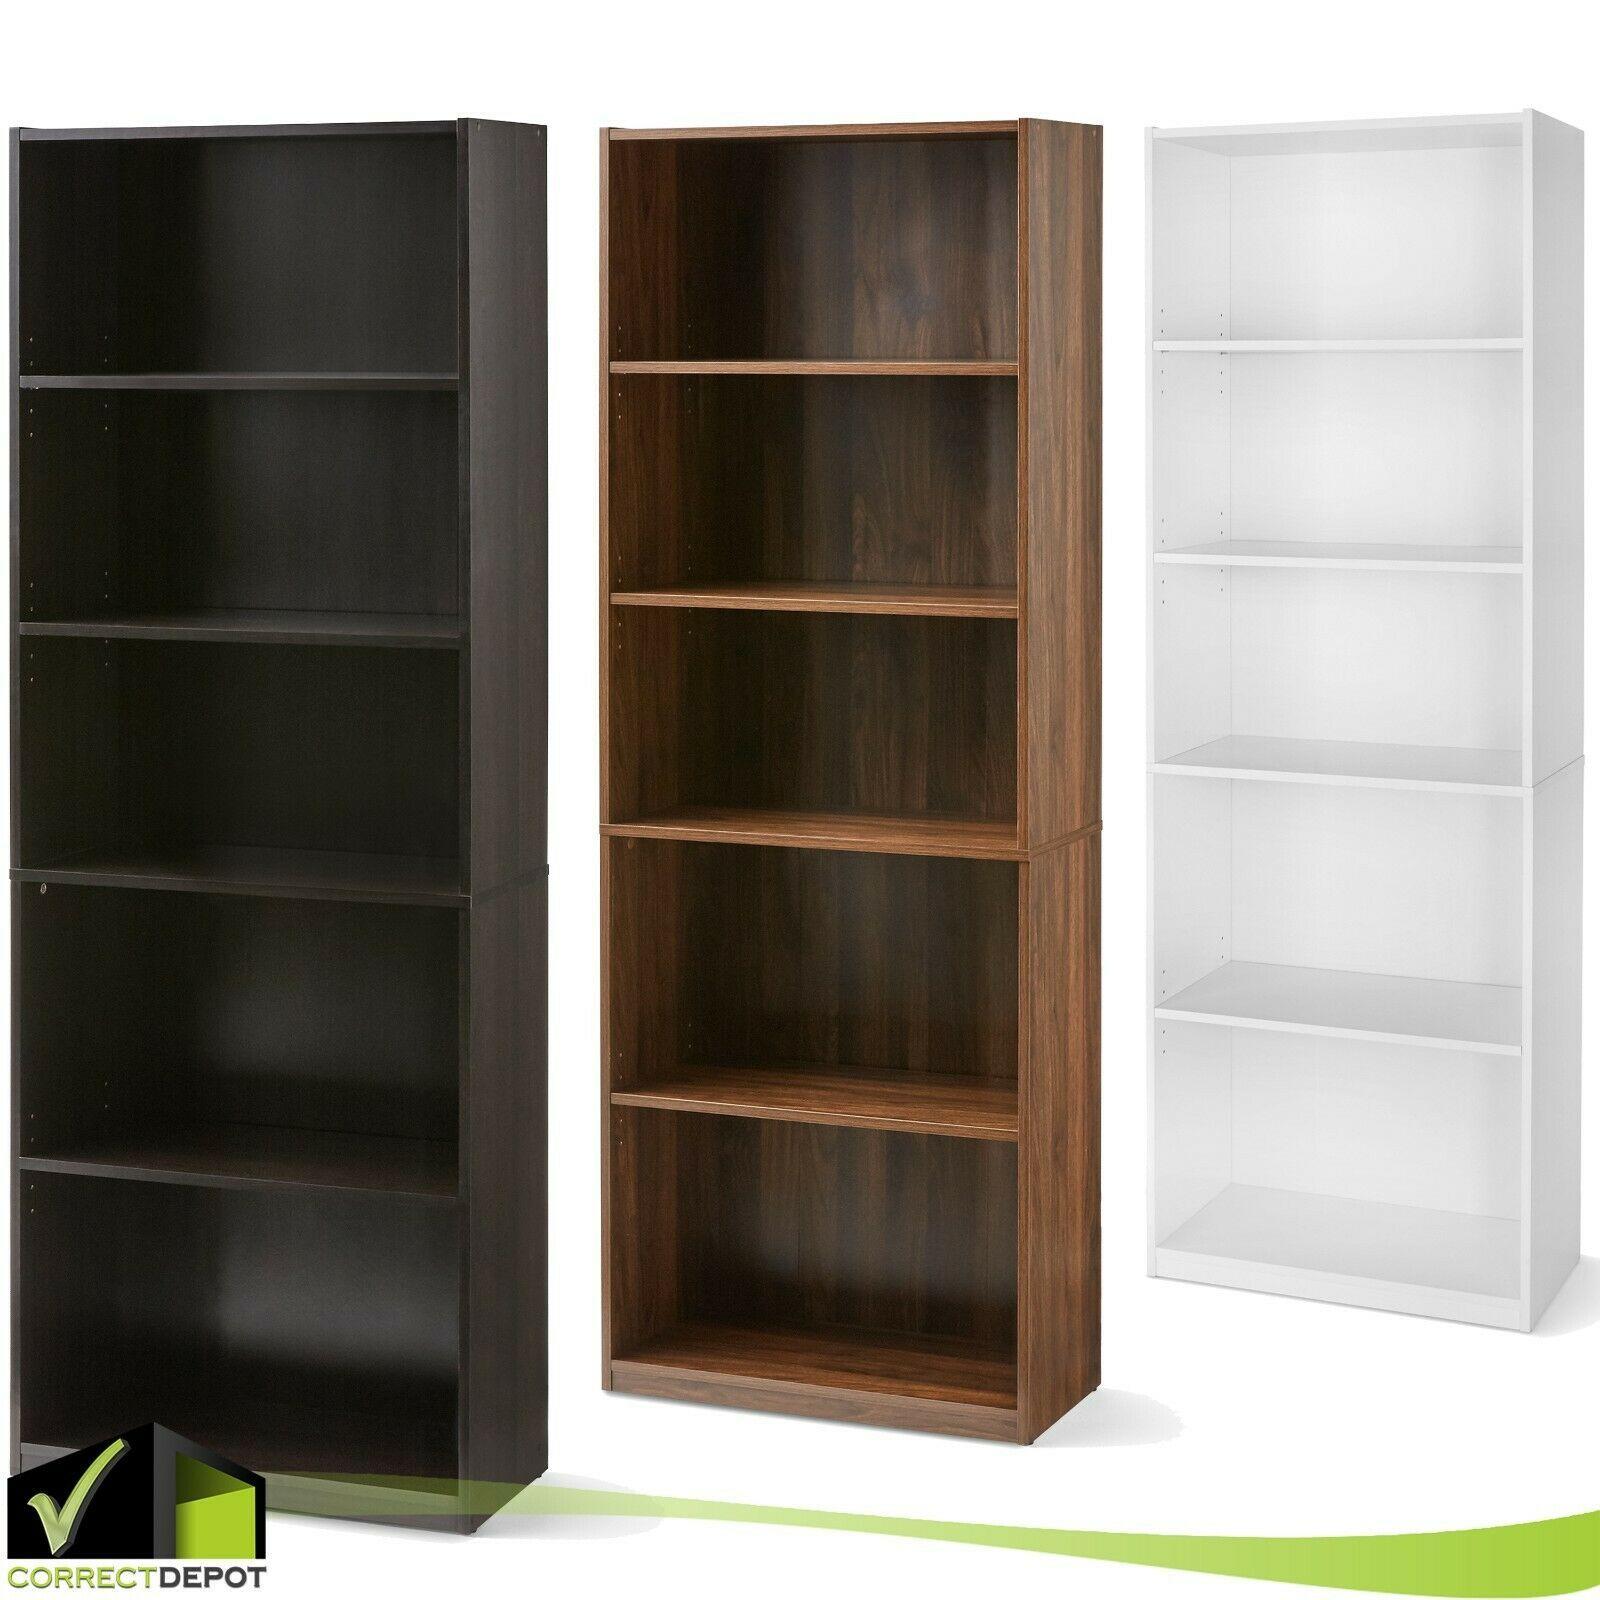 Adjustable 5 Shelf Bookcase Book Wide Wood Furniture Storage